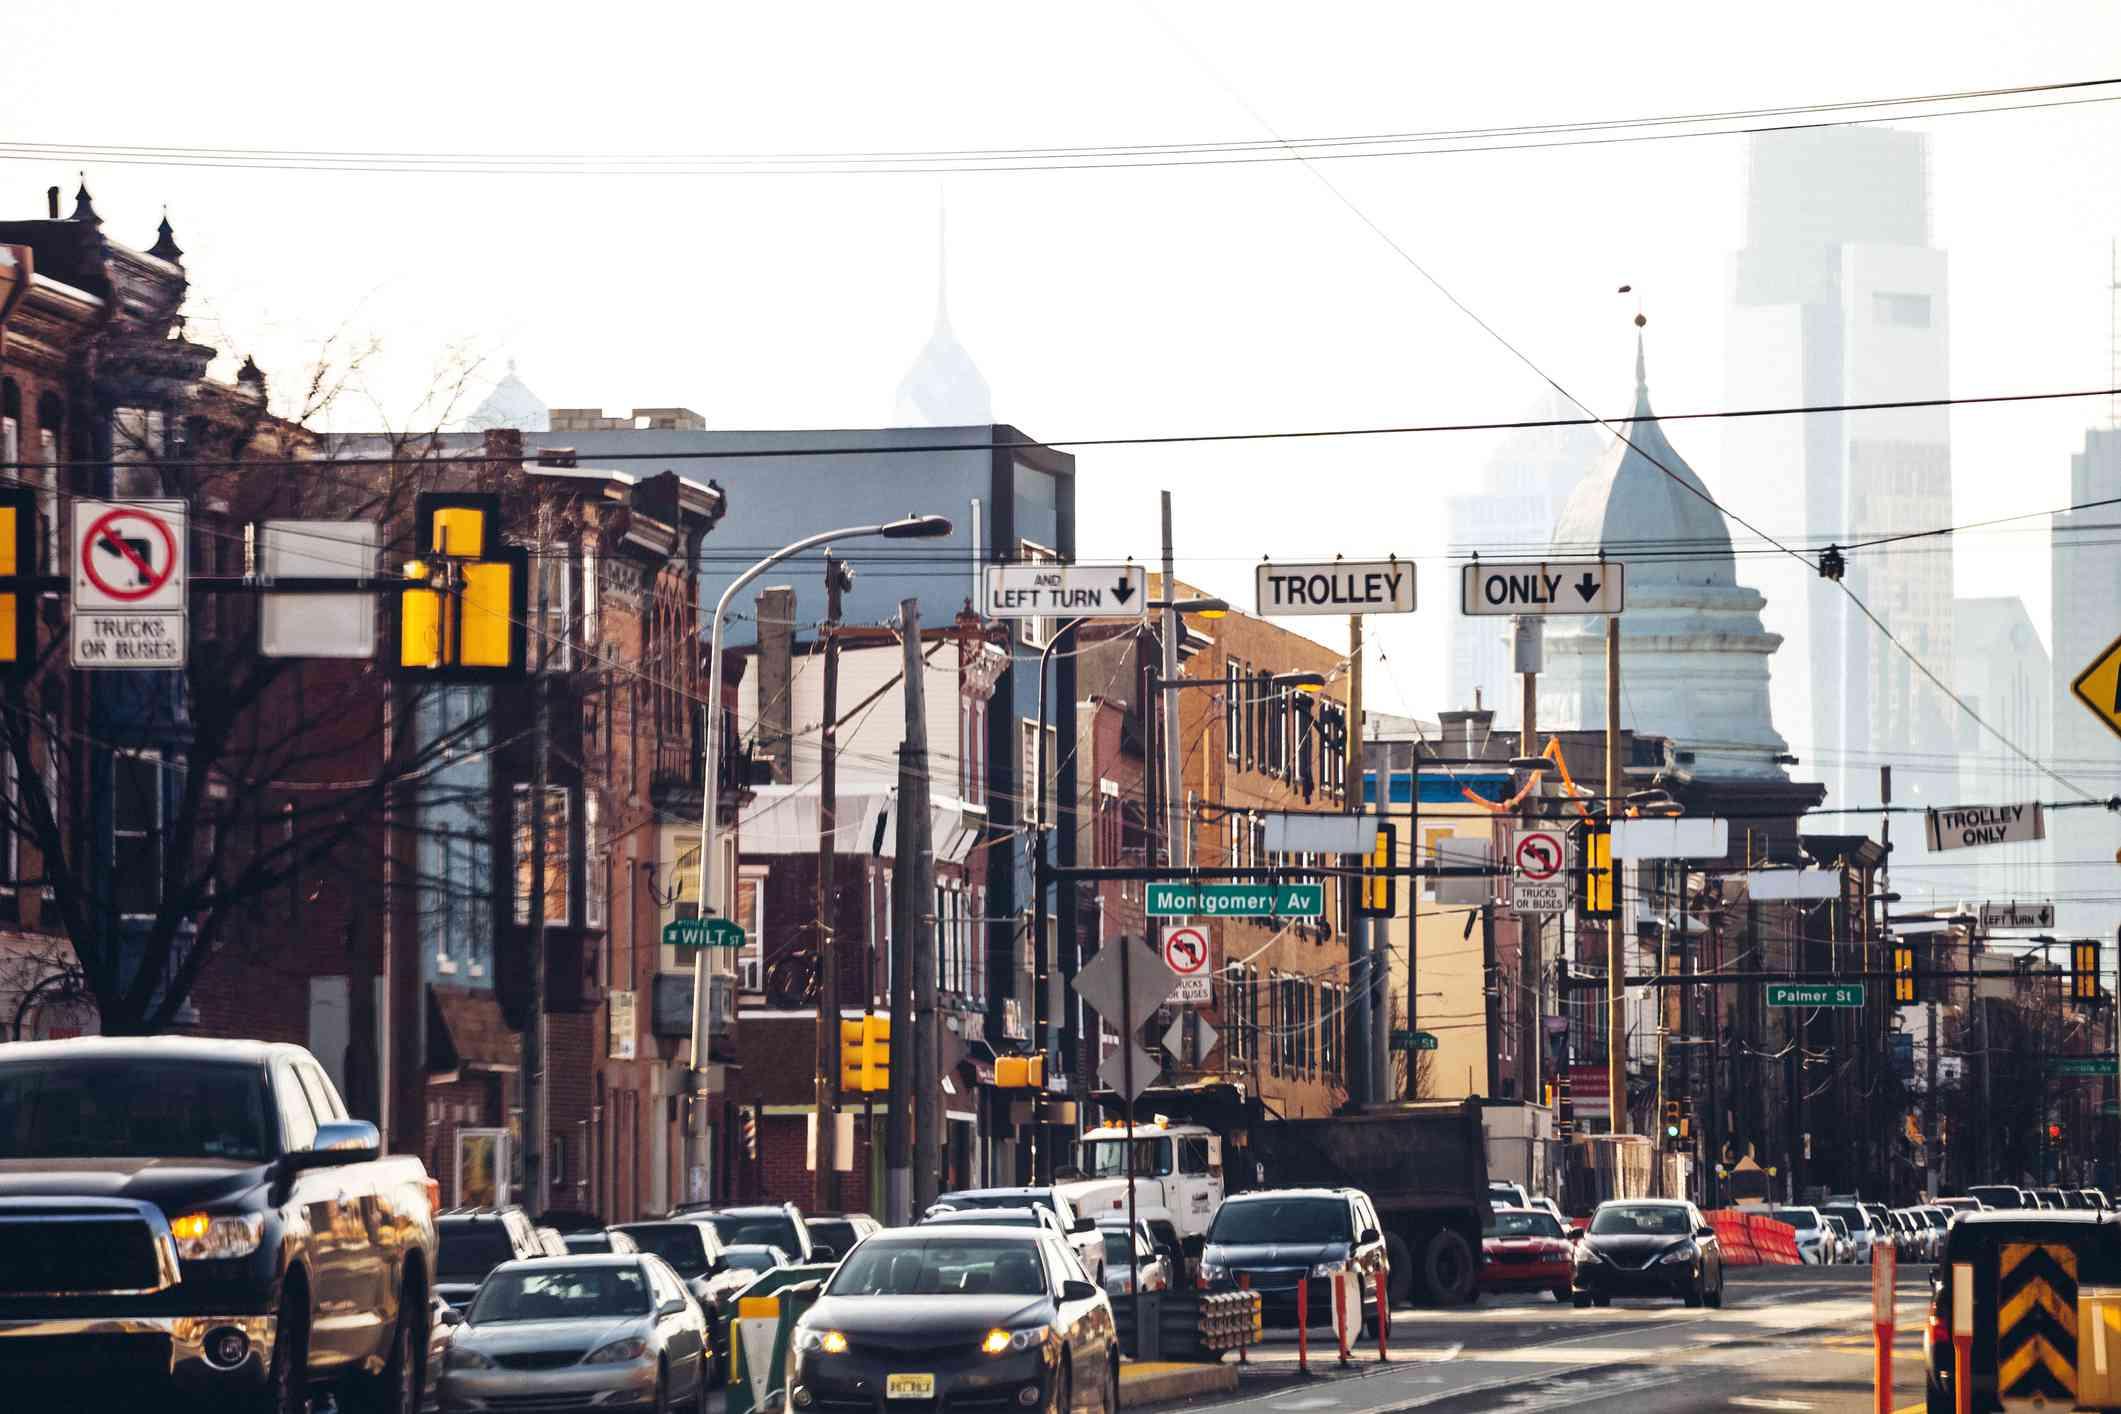 Fishtown neighborhood of Philly